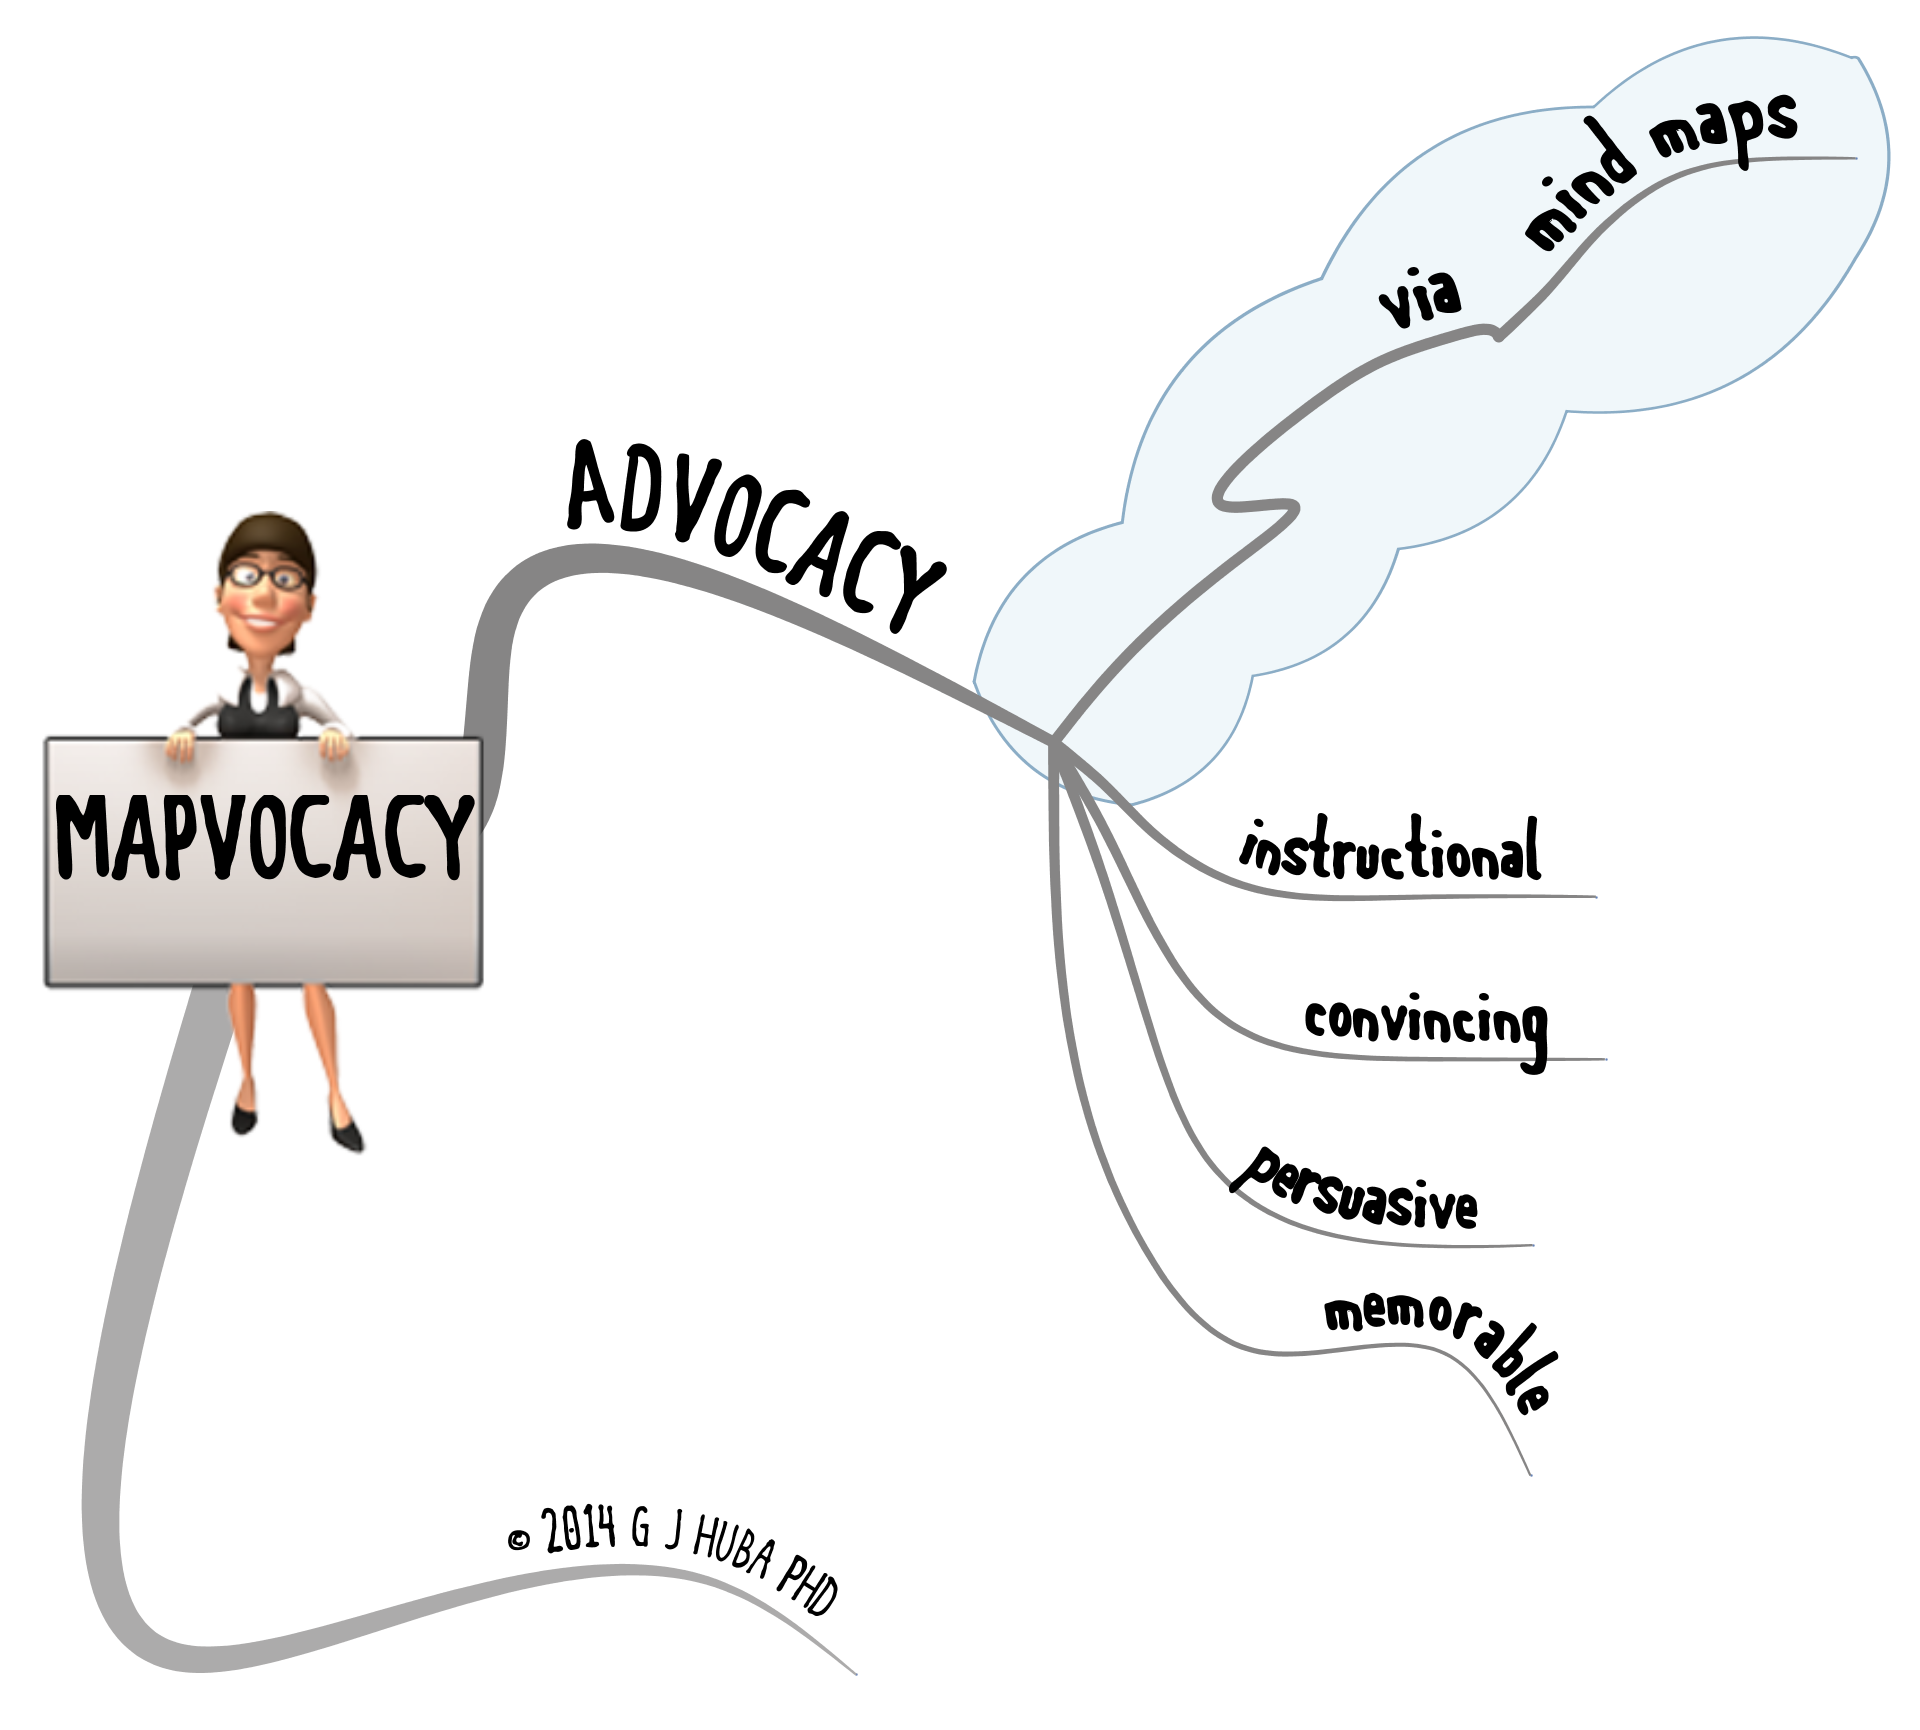 mapvocacy